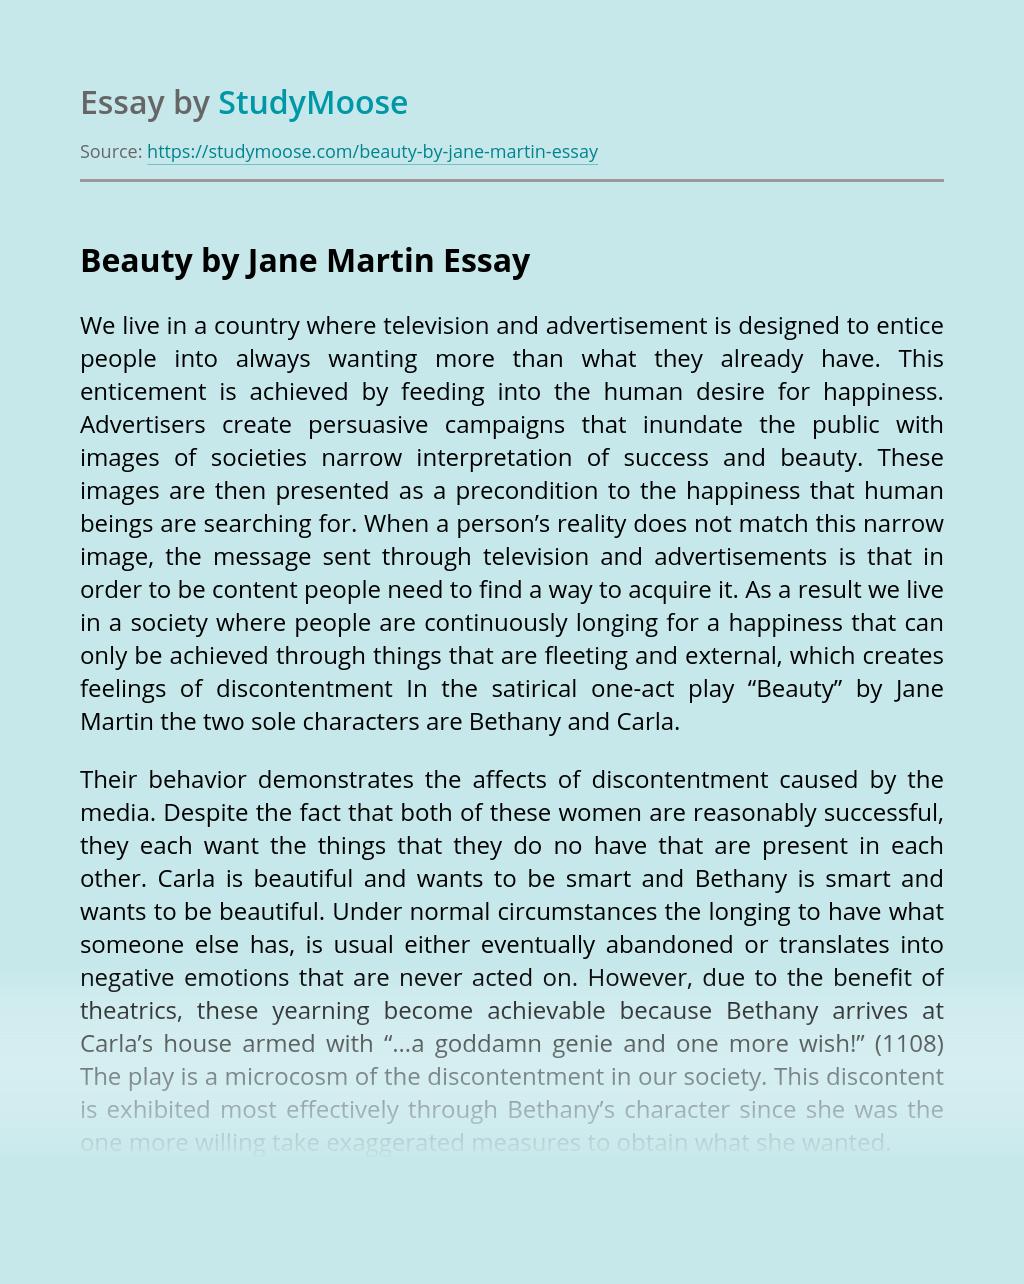 Beauty by Jane Martin